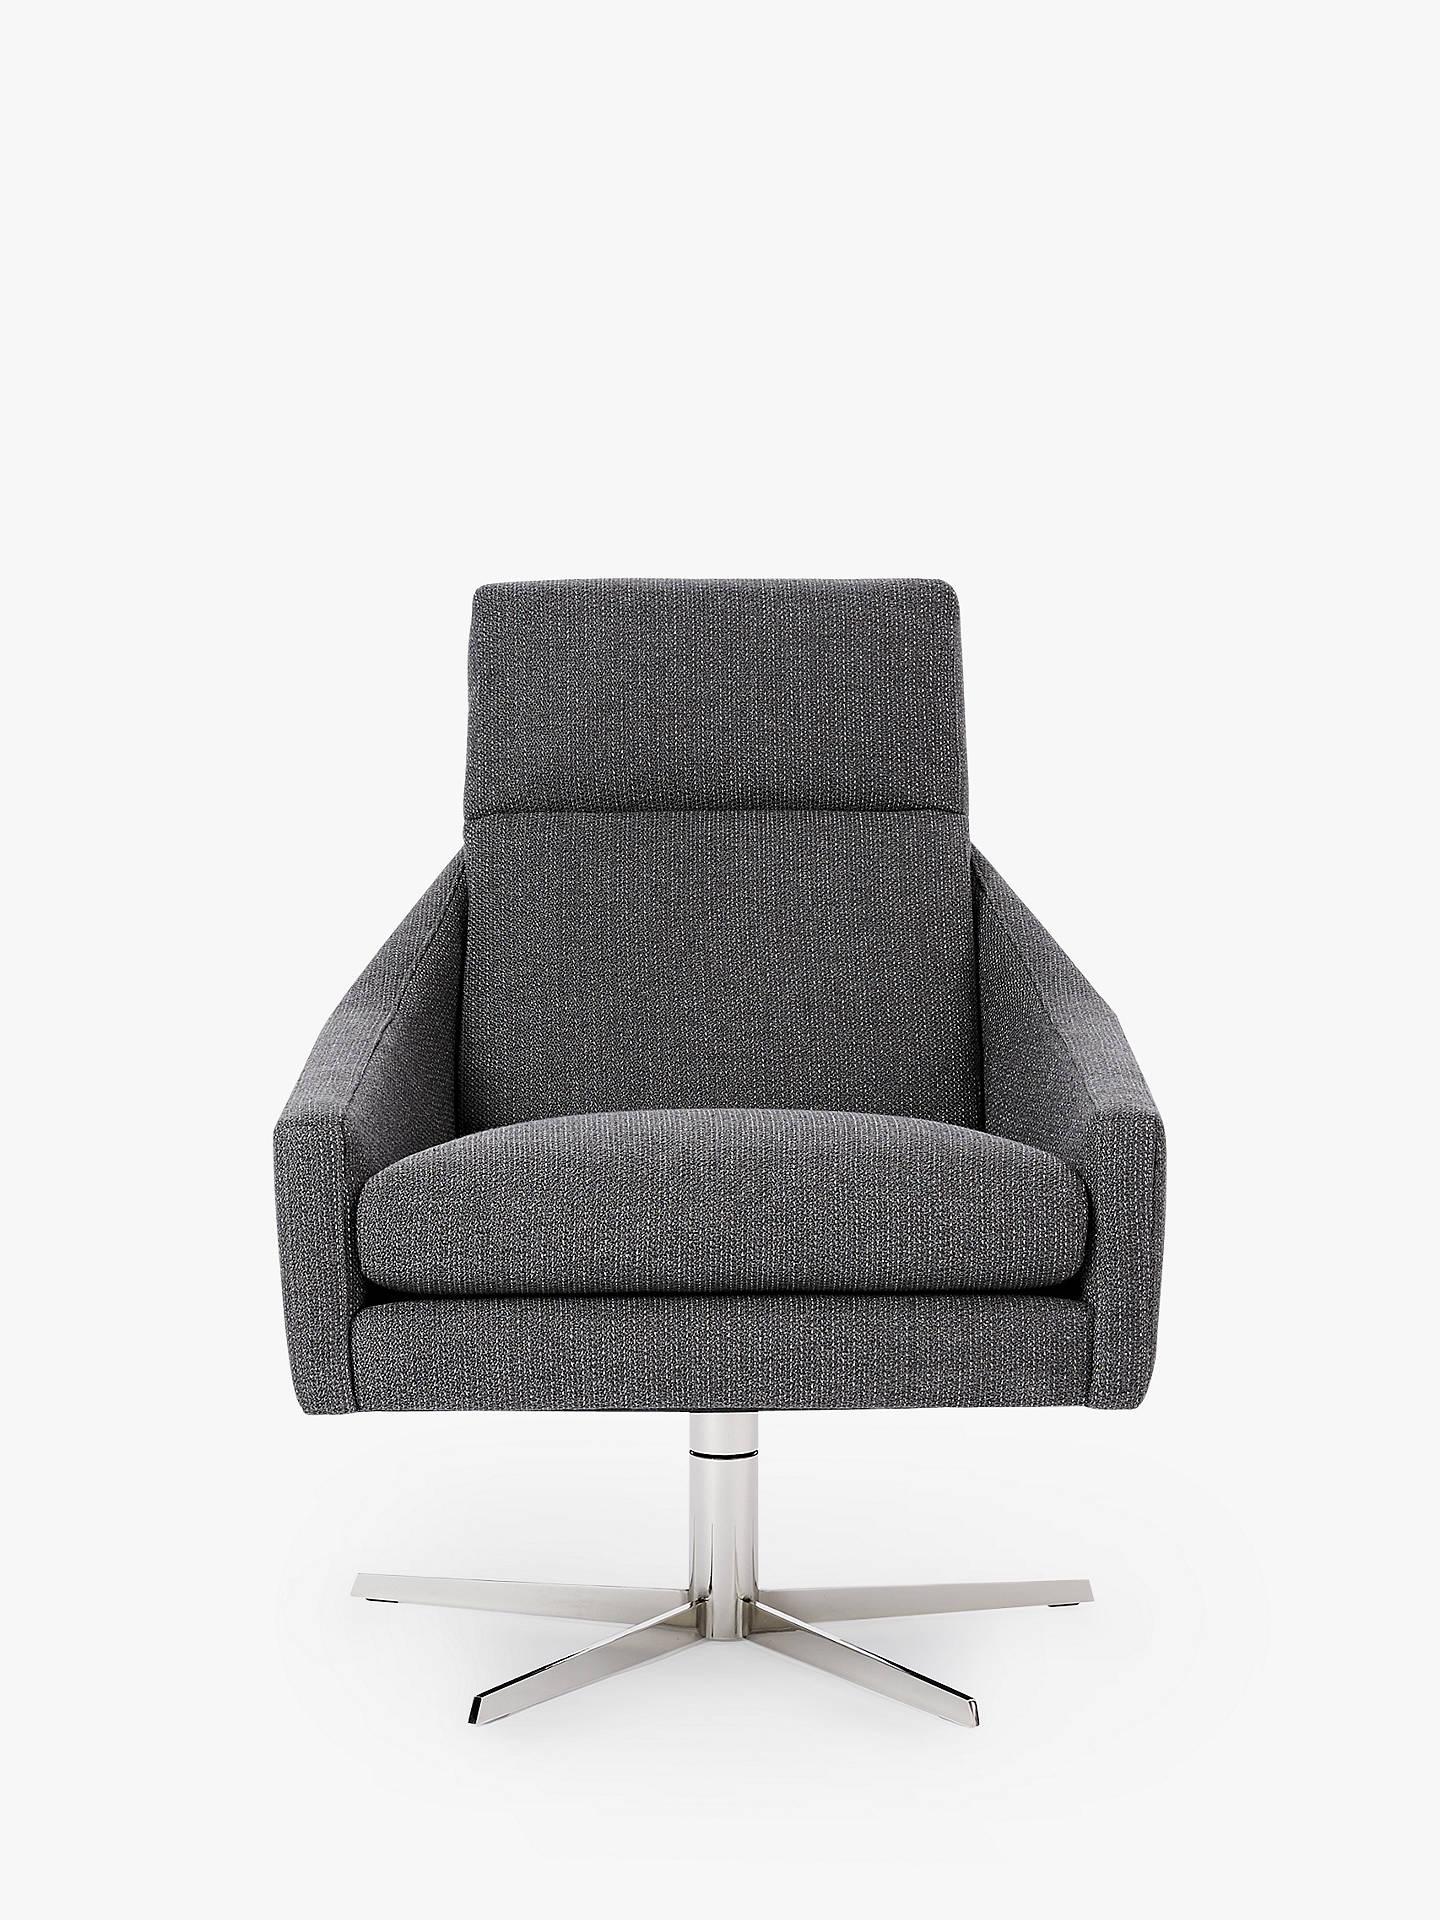 Fine West Elm Austin Swivel Chair Mod Weave Grey At John Lewis Theyellowbook Wood Chair Design Ideas Theyellowbookinfo